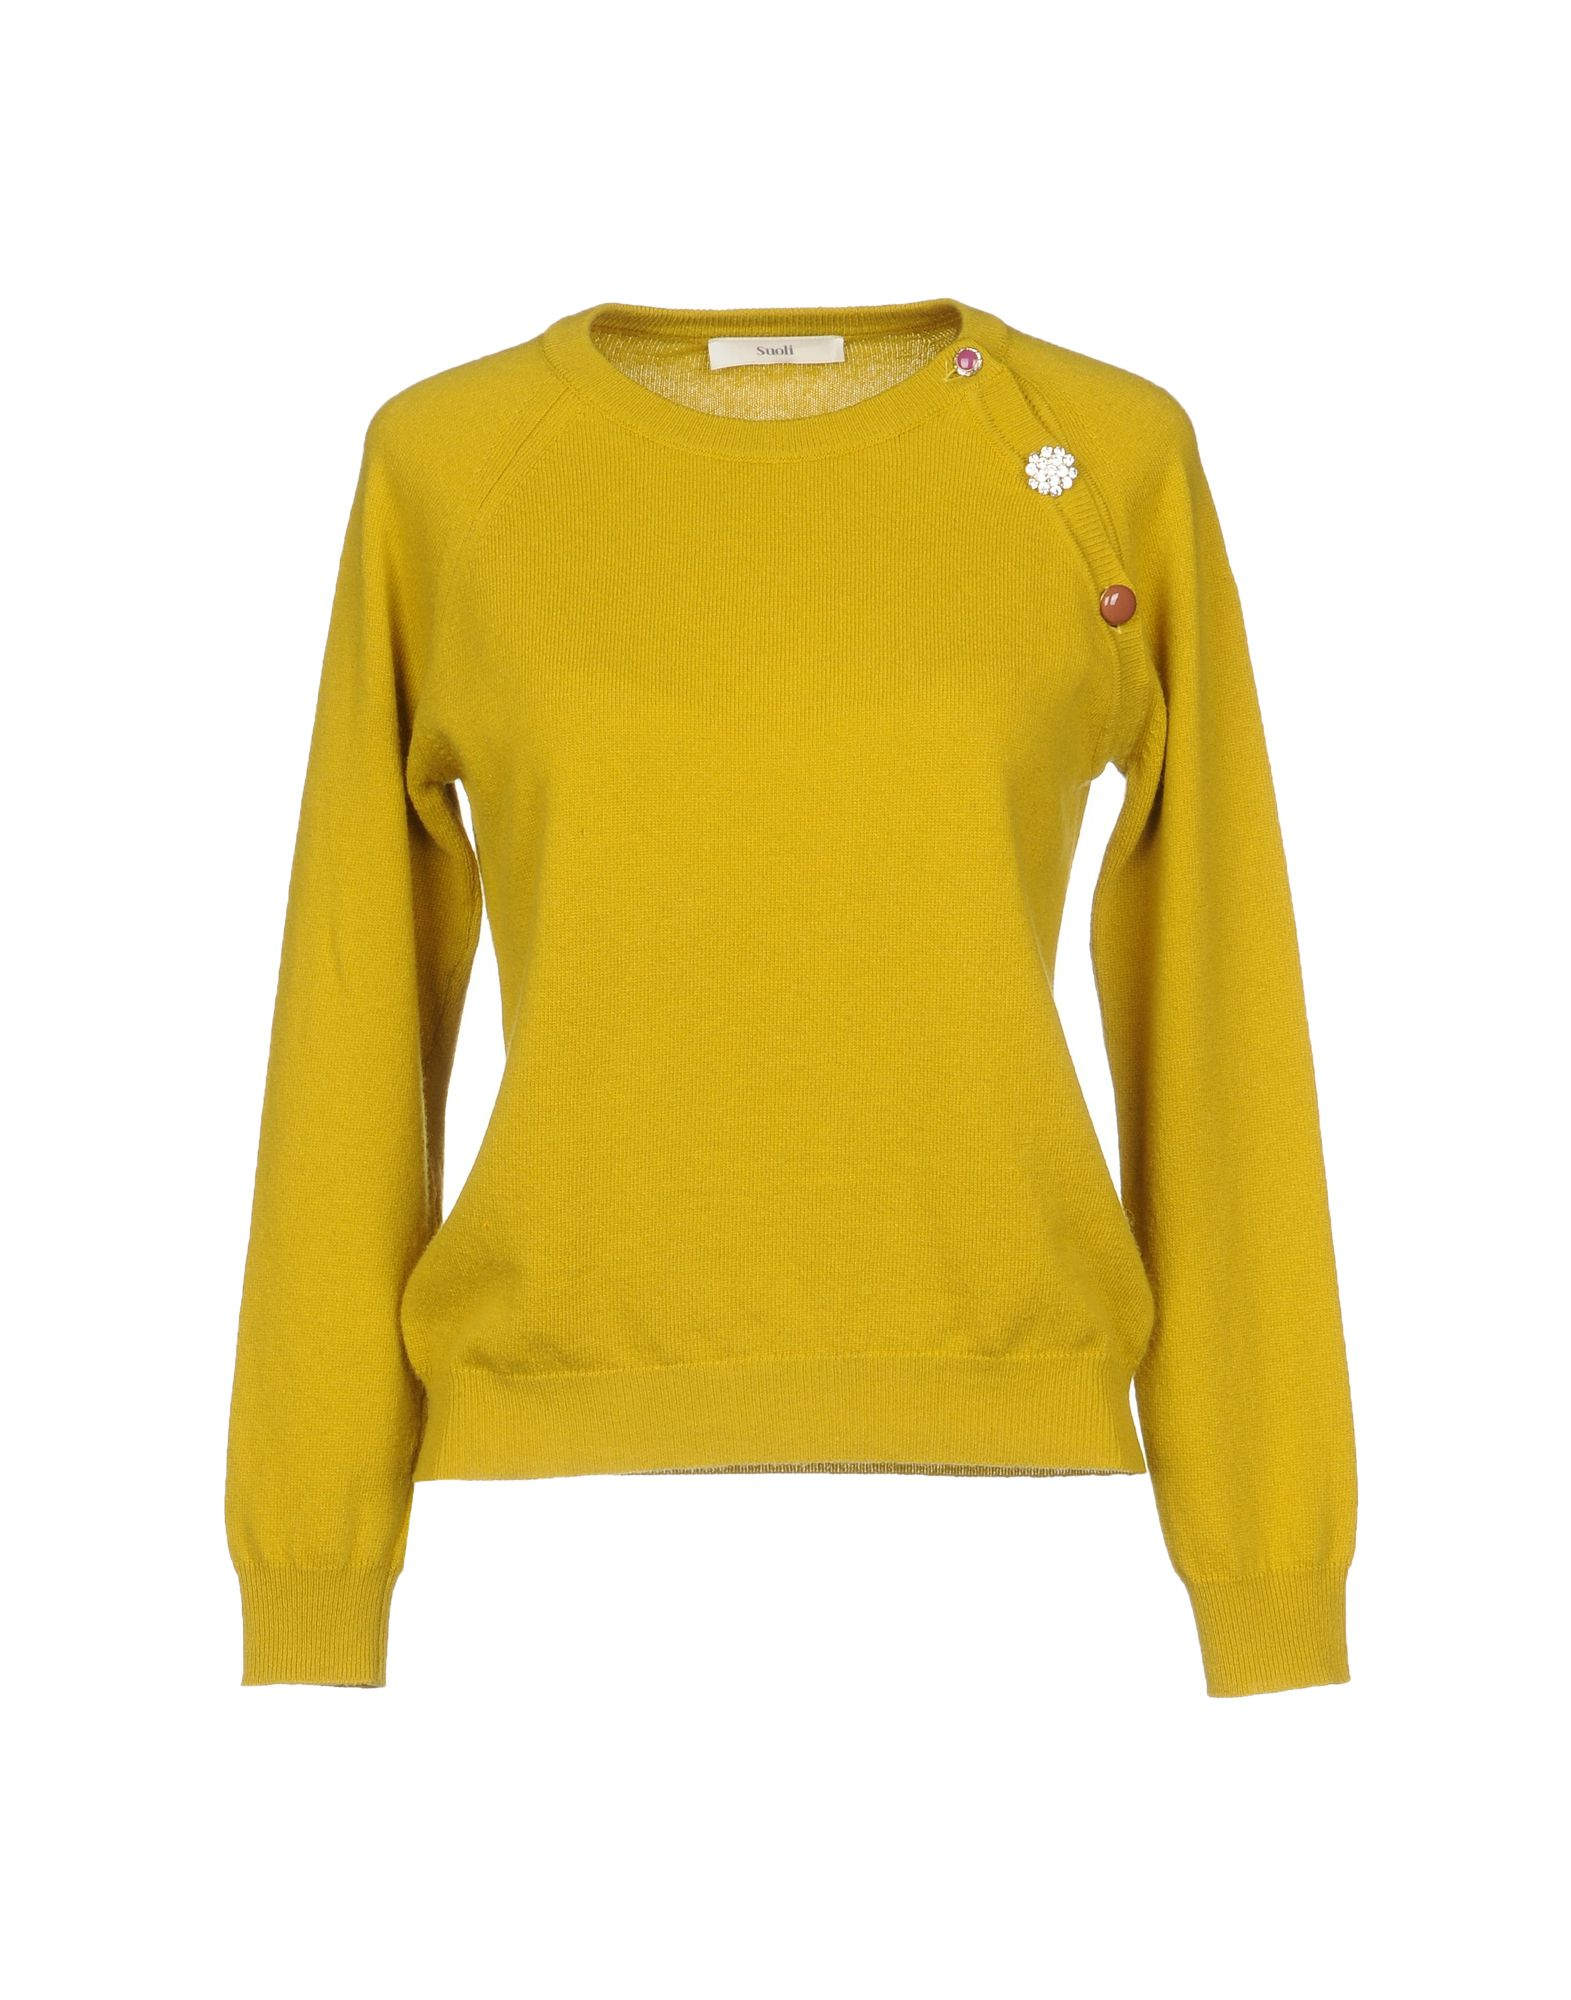 Pullover Suoli Donna - Acquista online su coeiymNzM